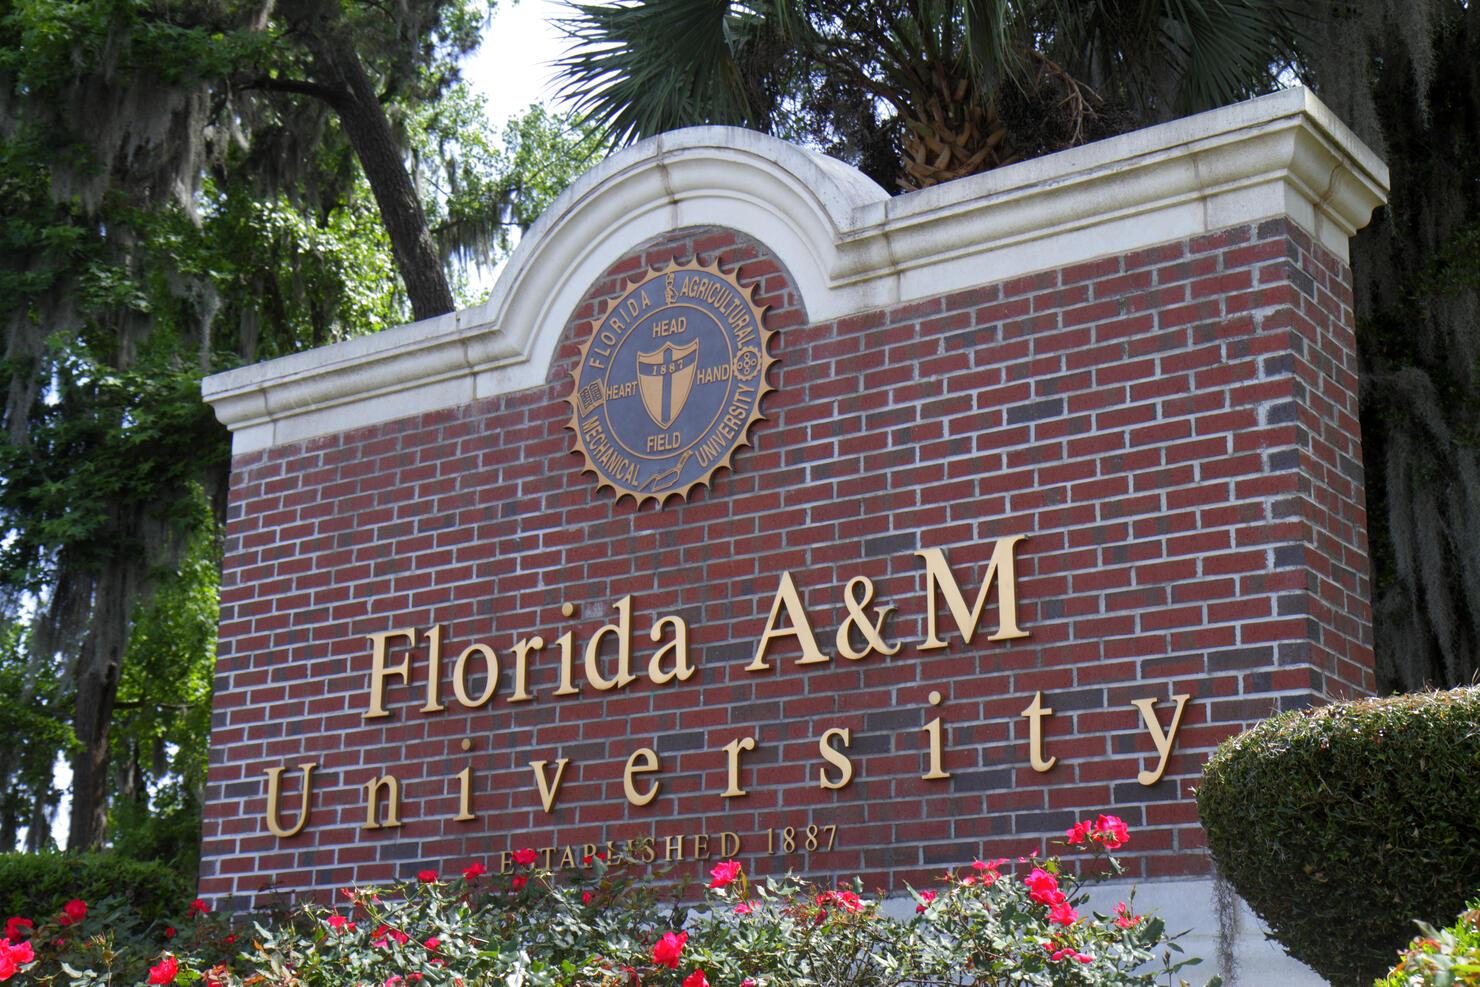 Hancock Whitney Announces Partnership with Florida A&M University